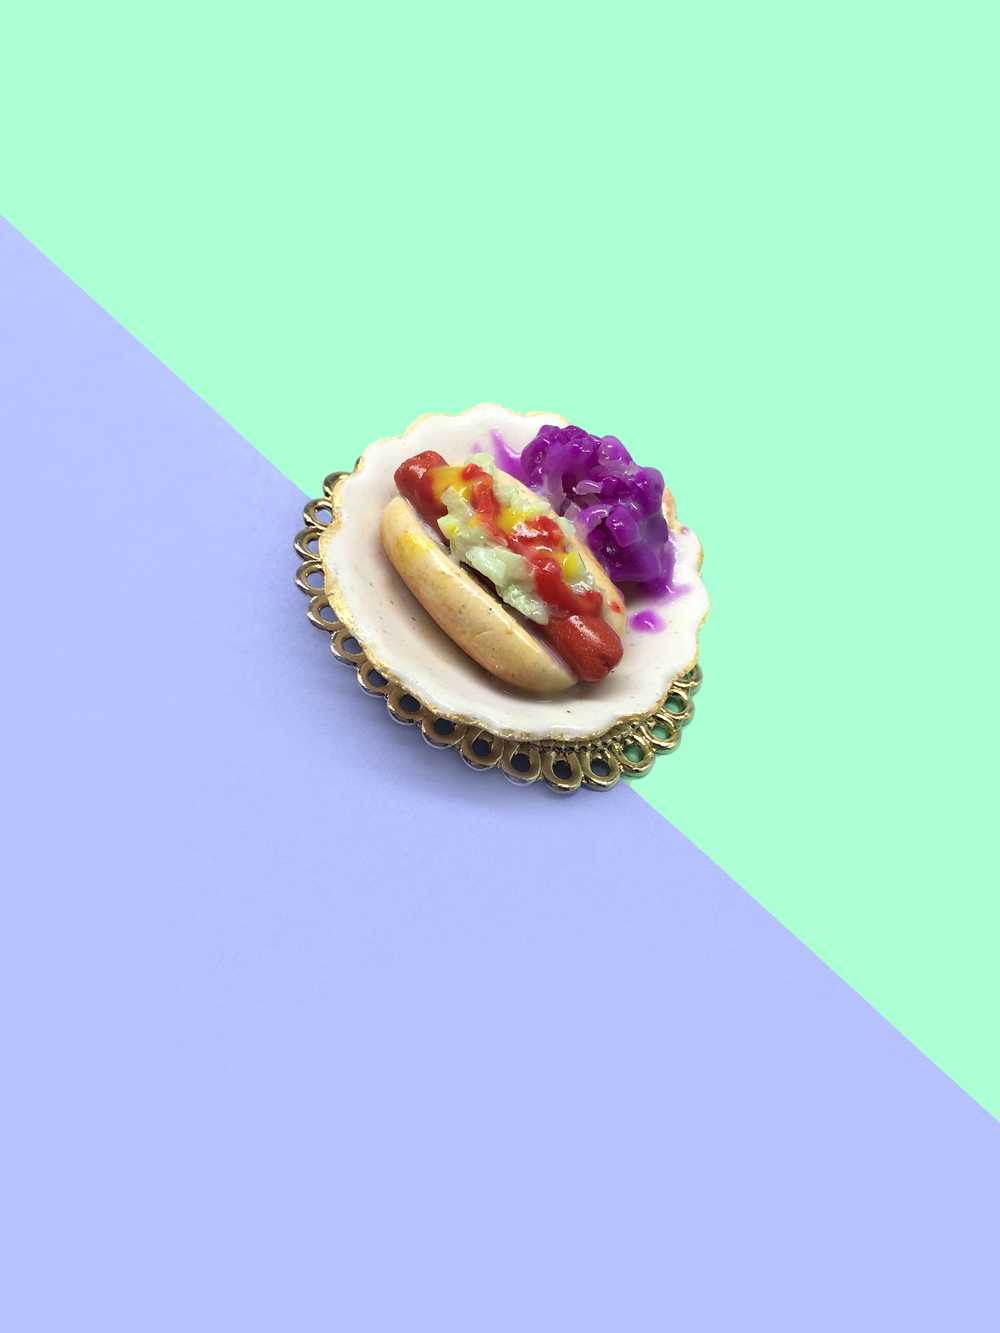 Foodxury - Hot Dog 03.jpg